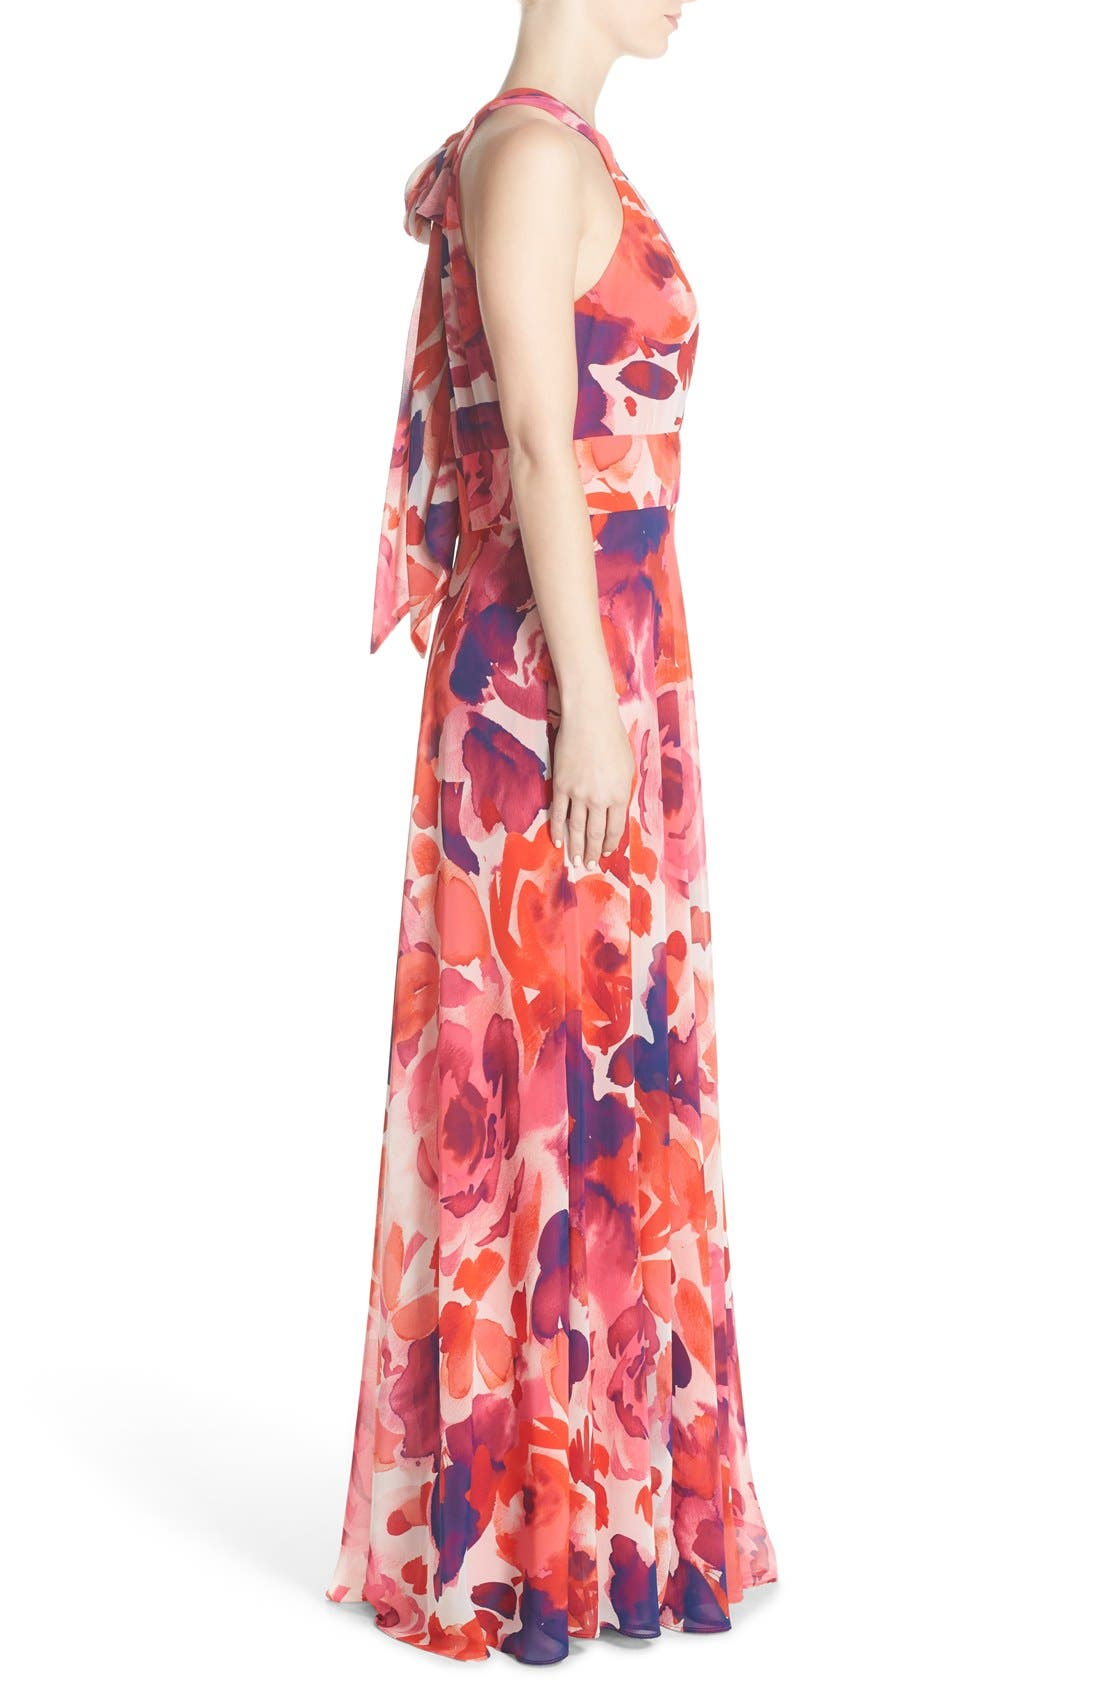 Floral Print Halter Maxi Dress,                             Alternate thumbnail 3, color,                             Pink/ Coral/ Purple